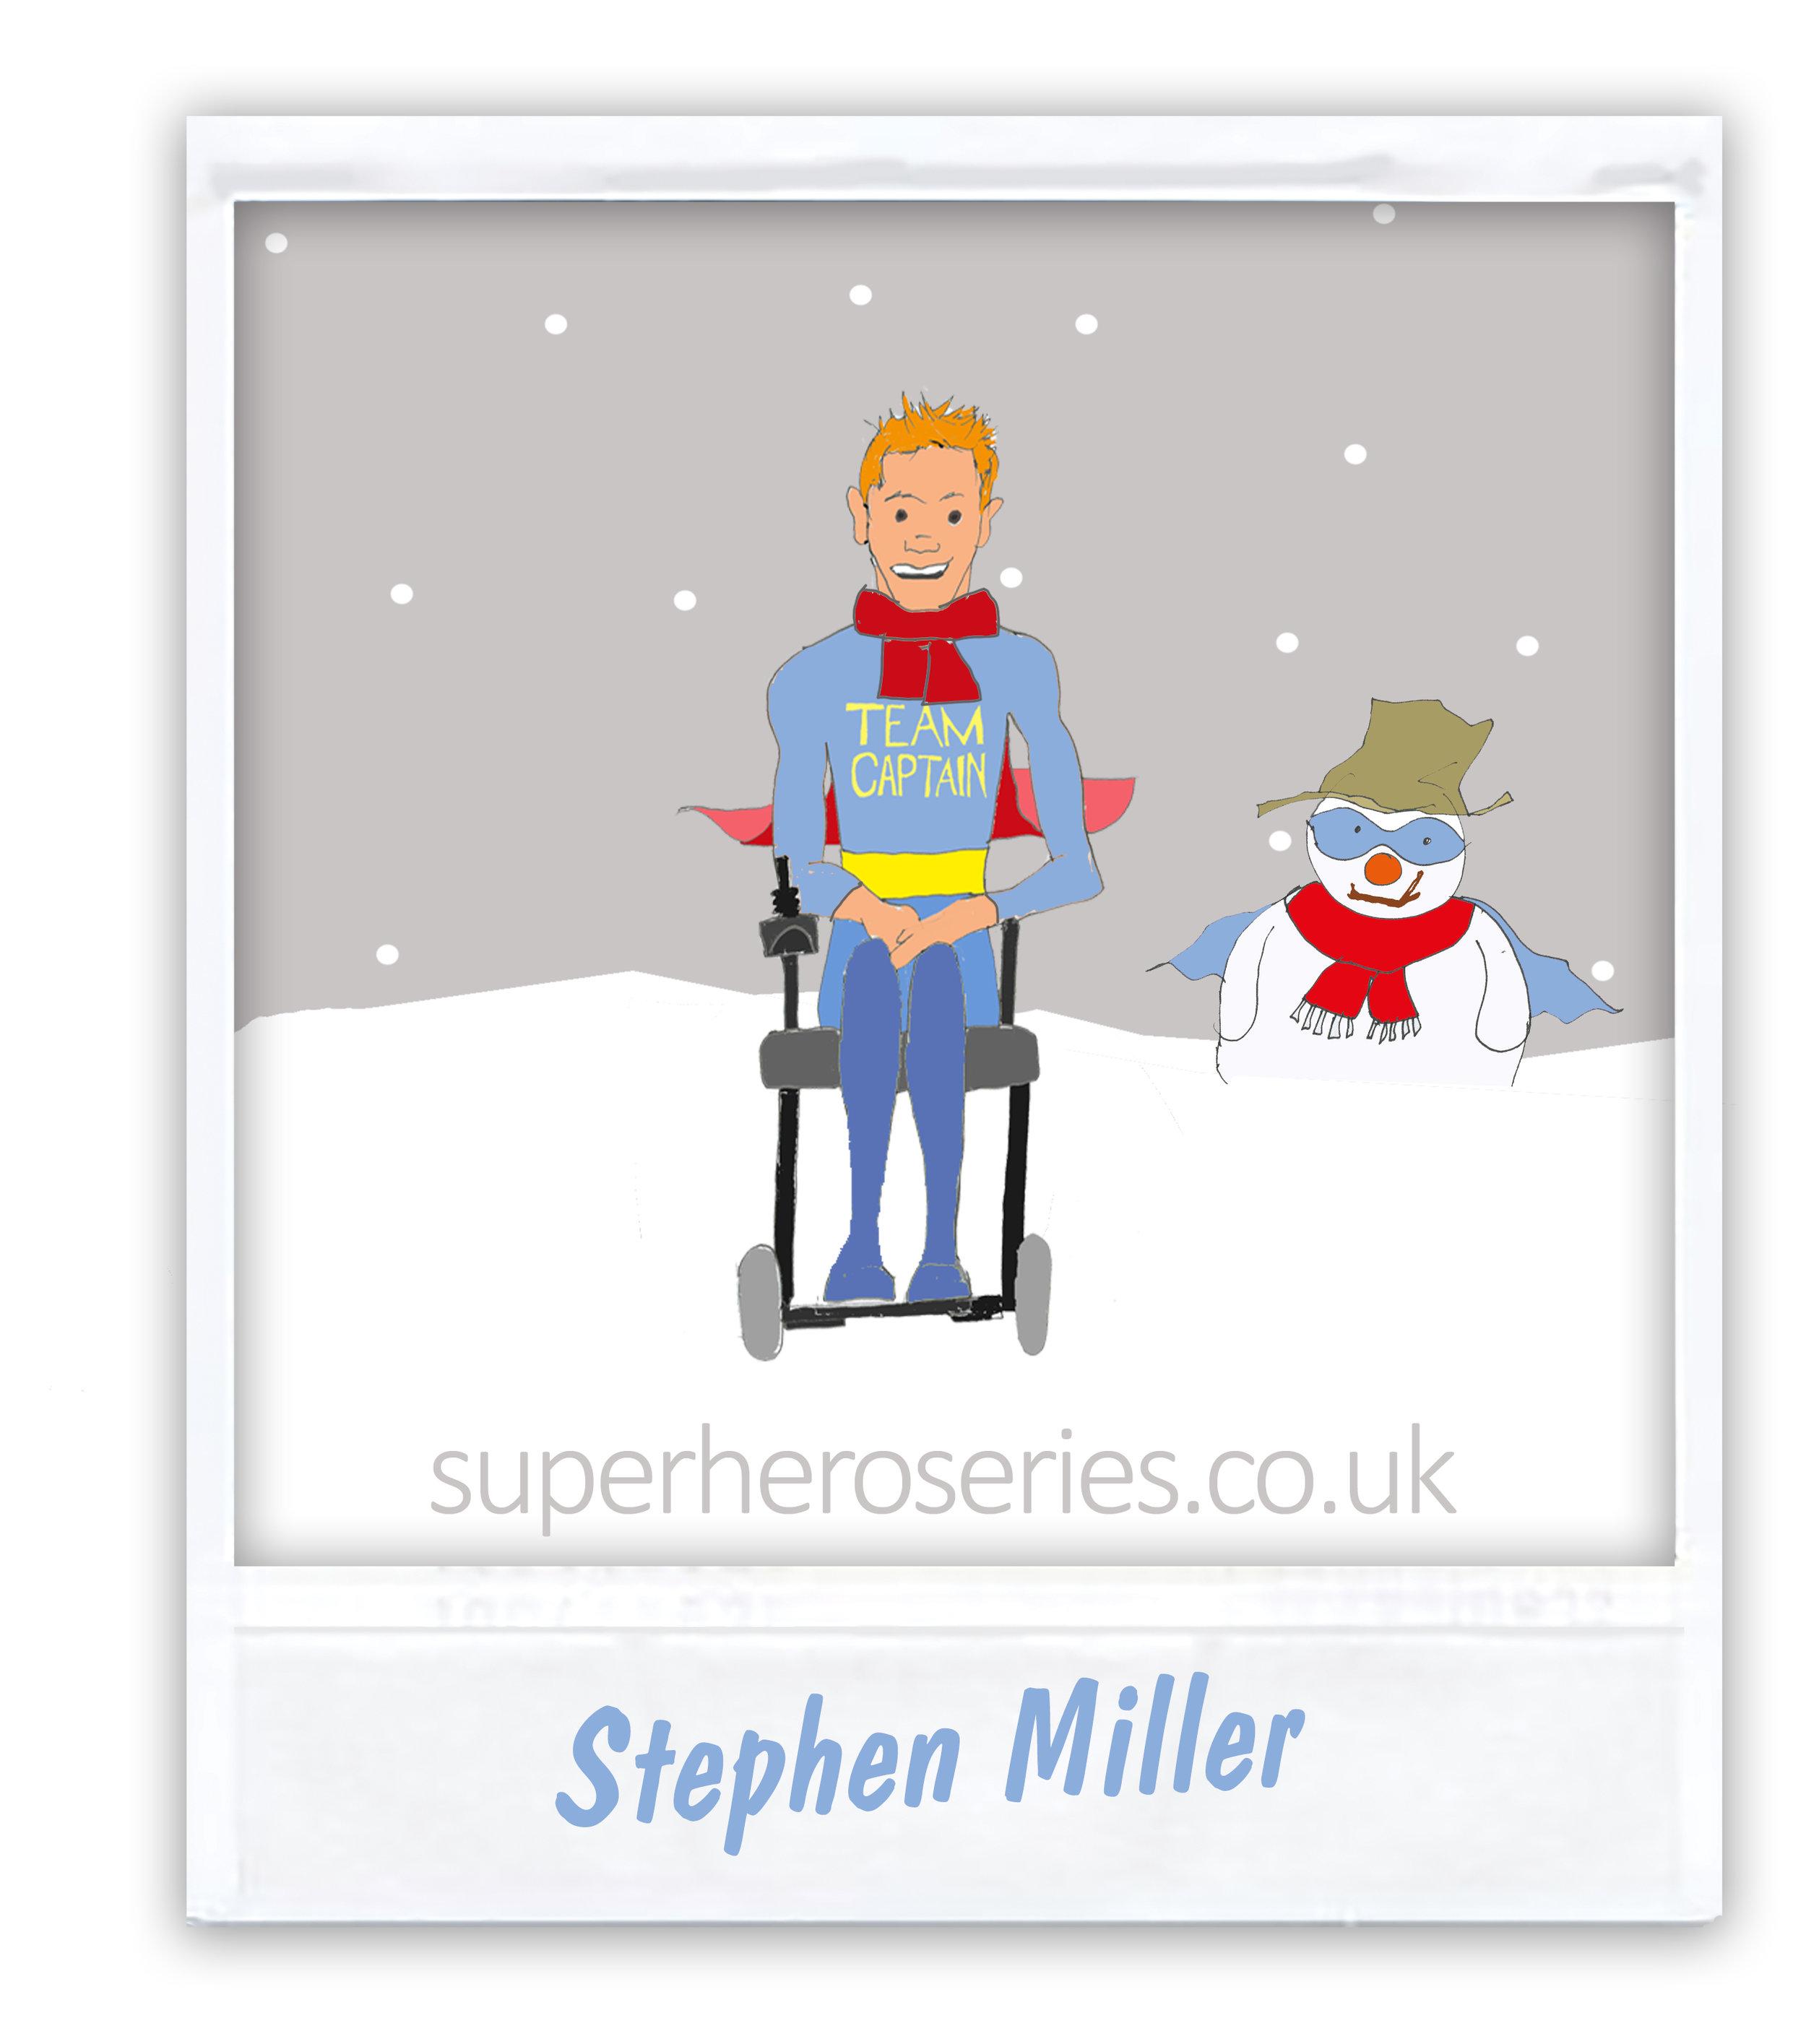 Stephen Miller high res.jpg